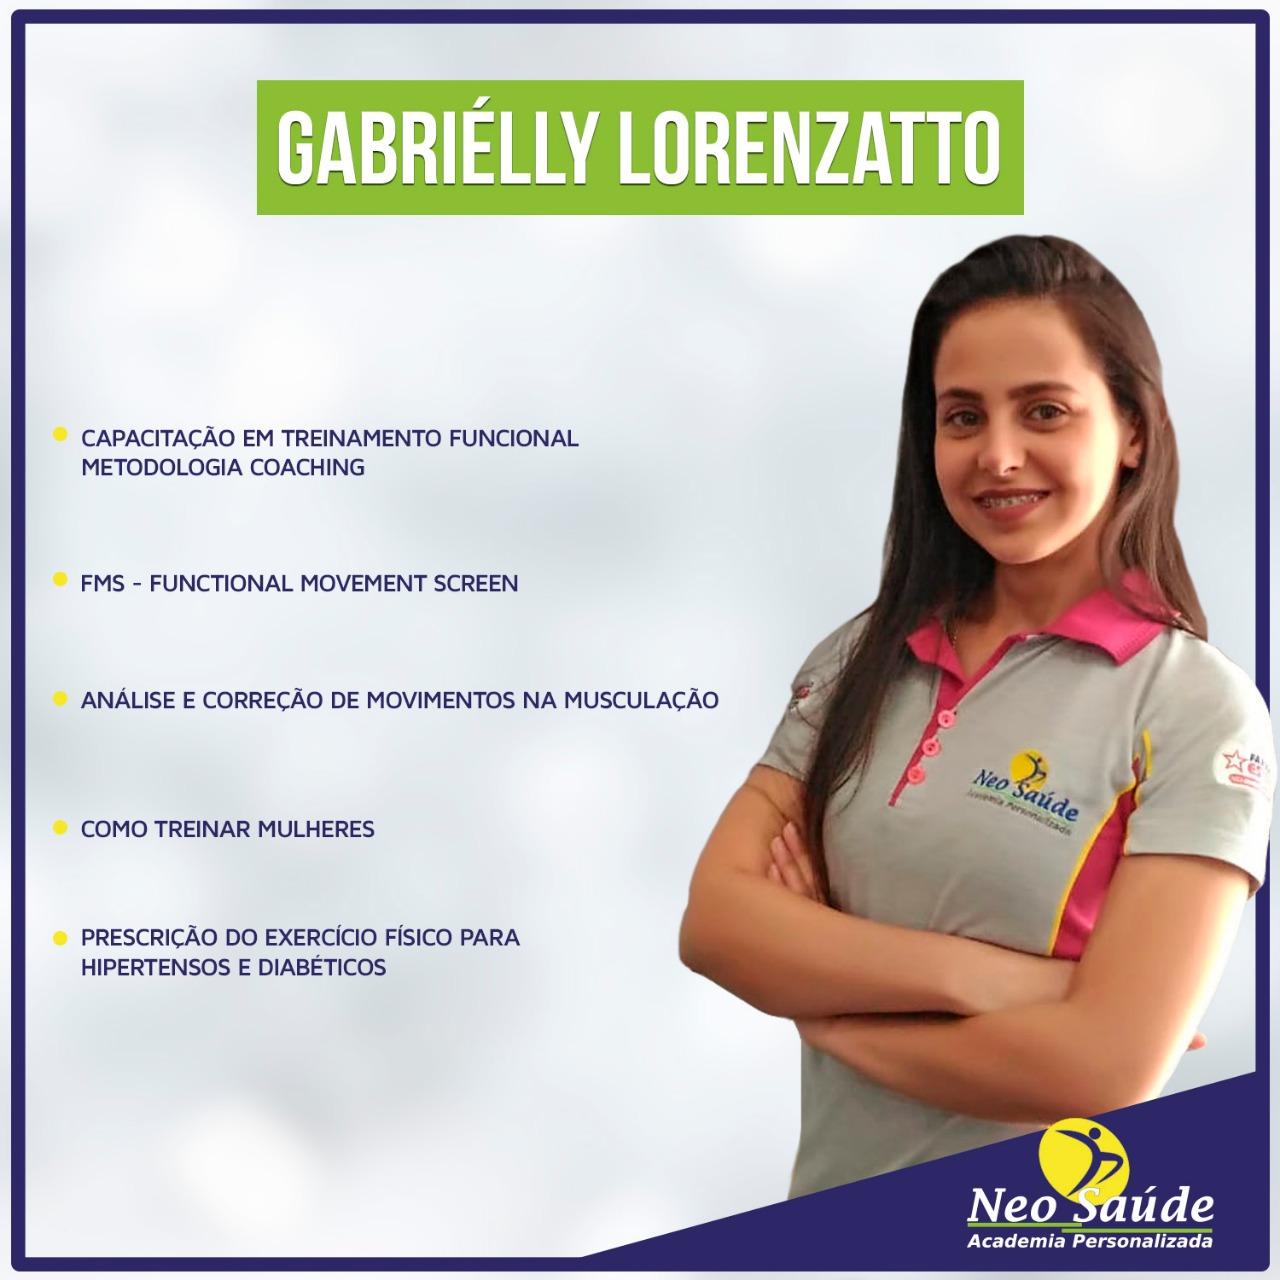 Gabriélly Lorenzatto